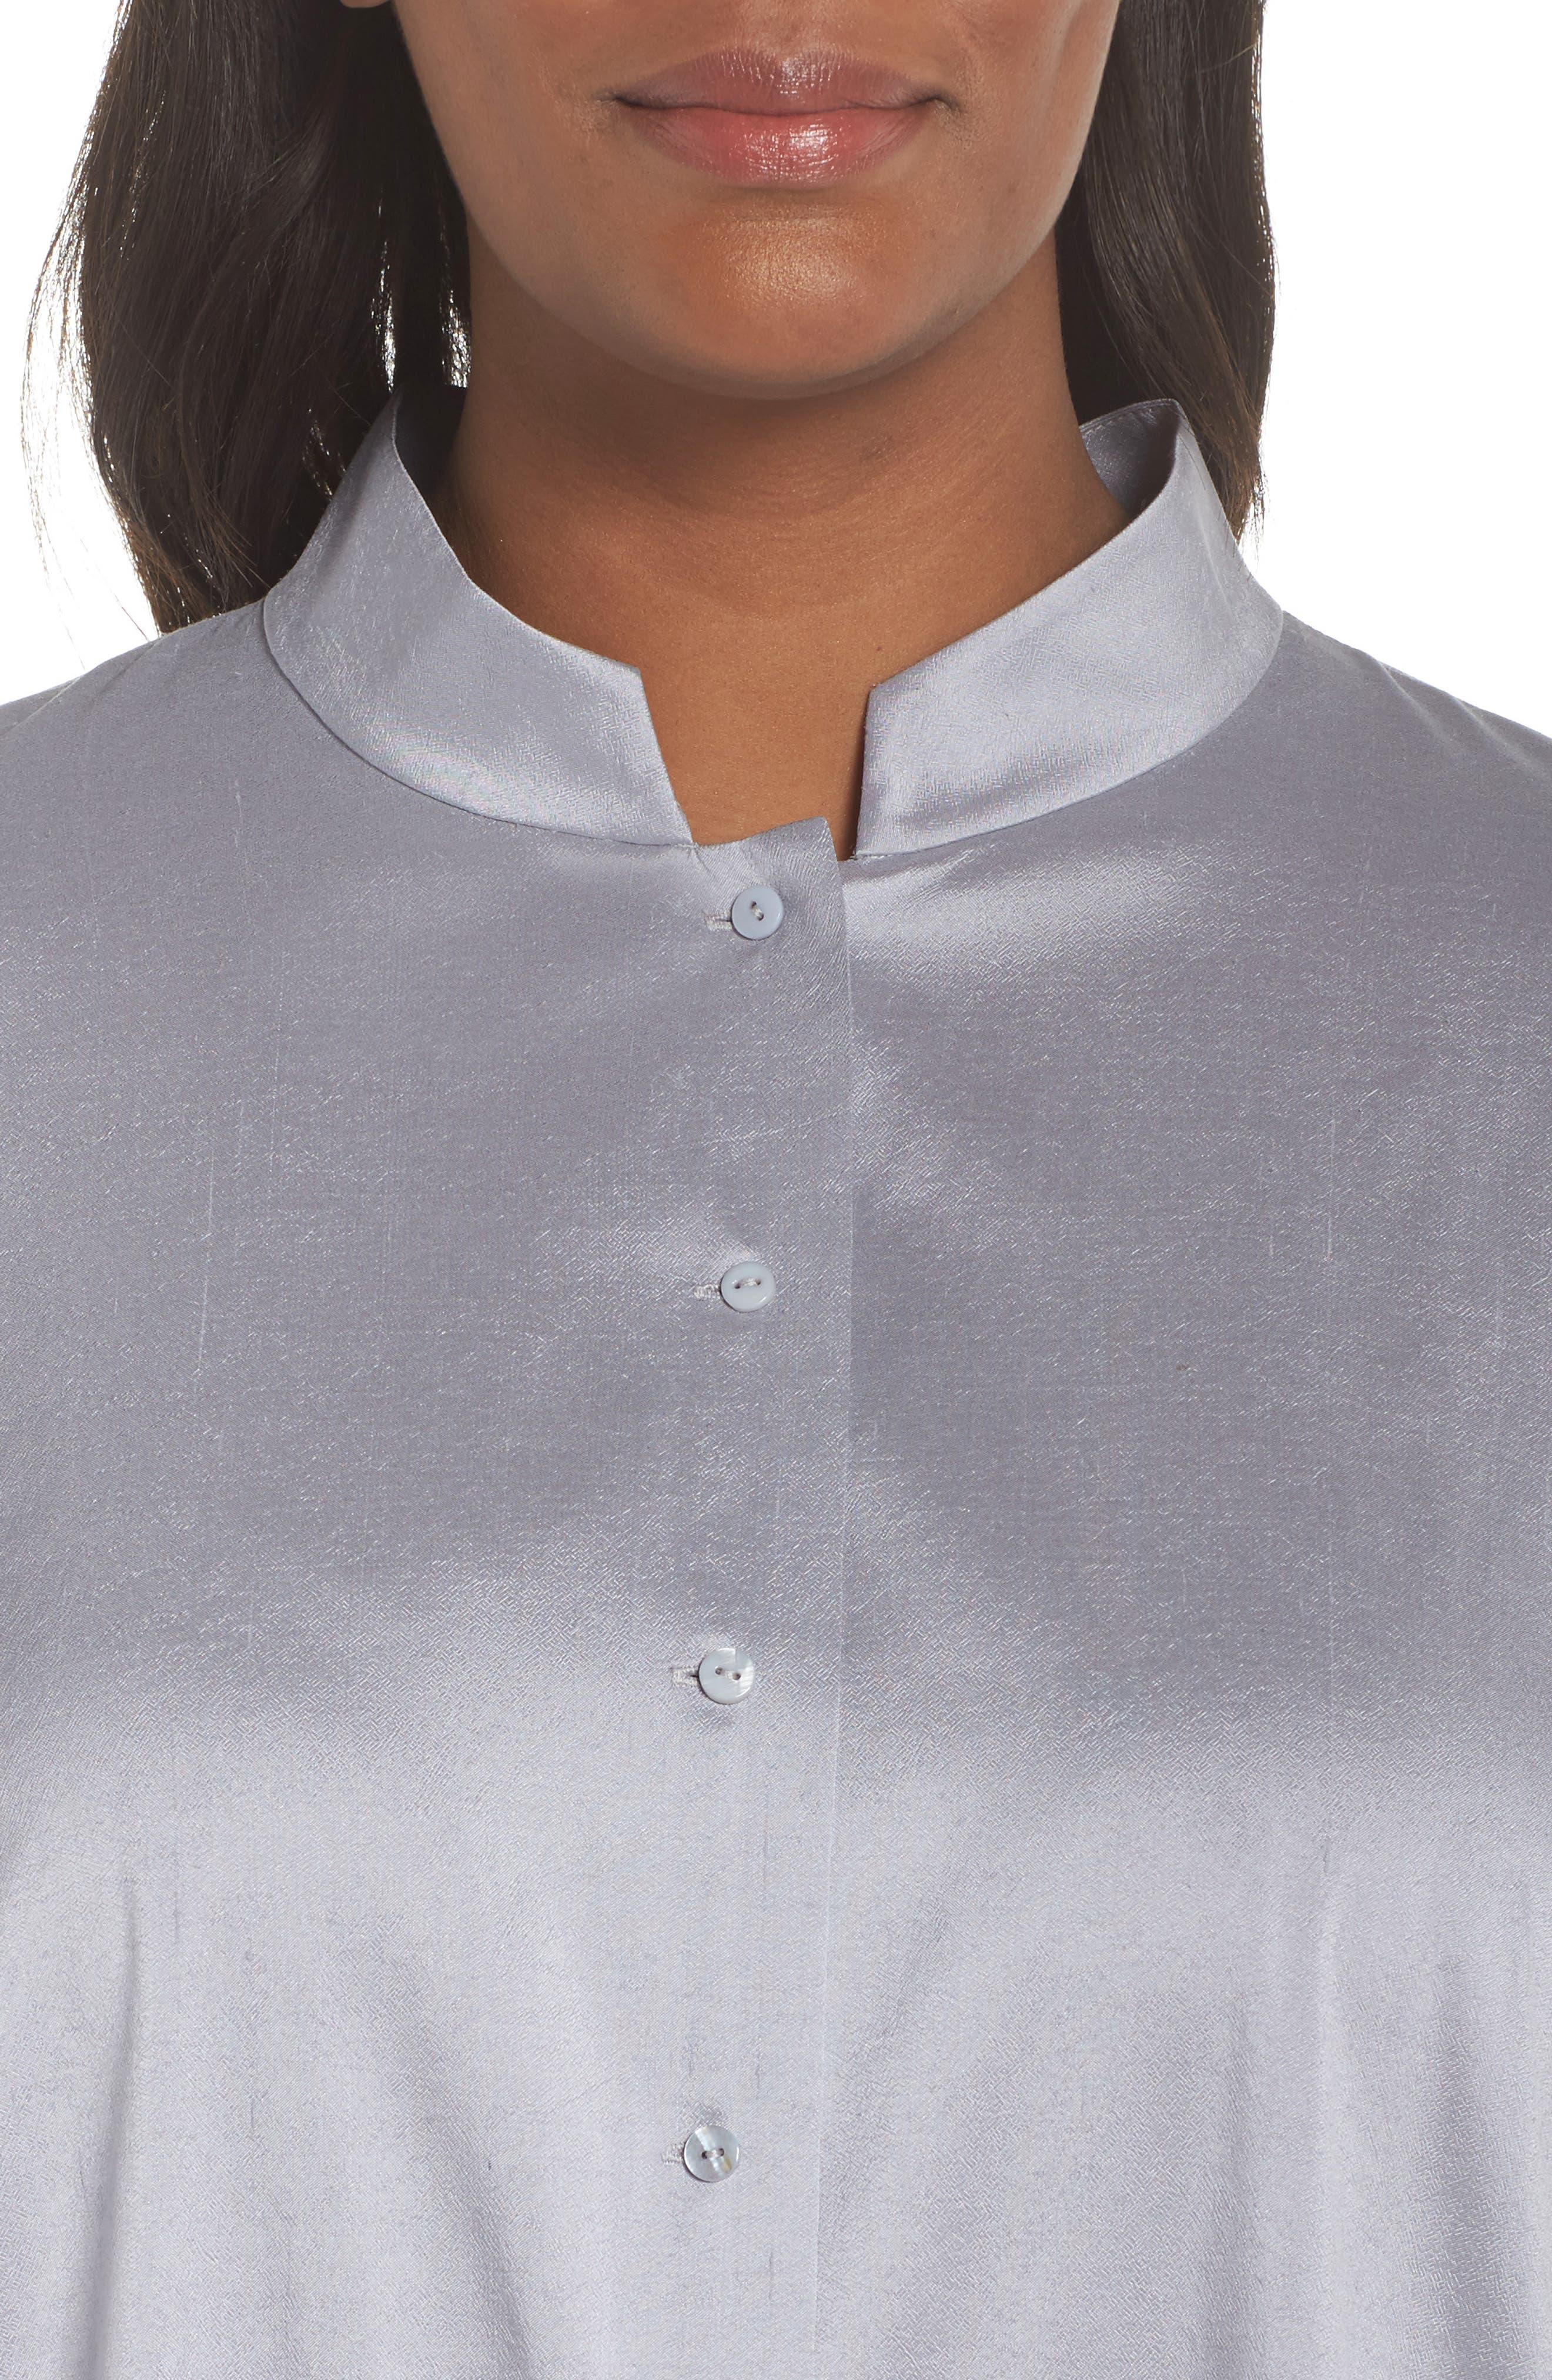 Notch Collar Shirt,                             Alternate thumbnail 7, color,